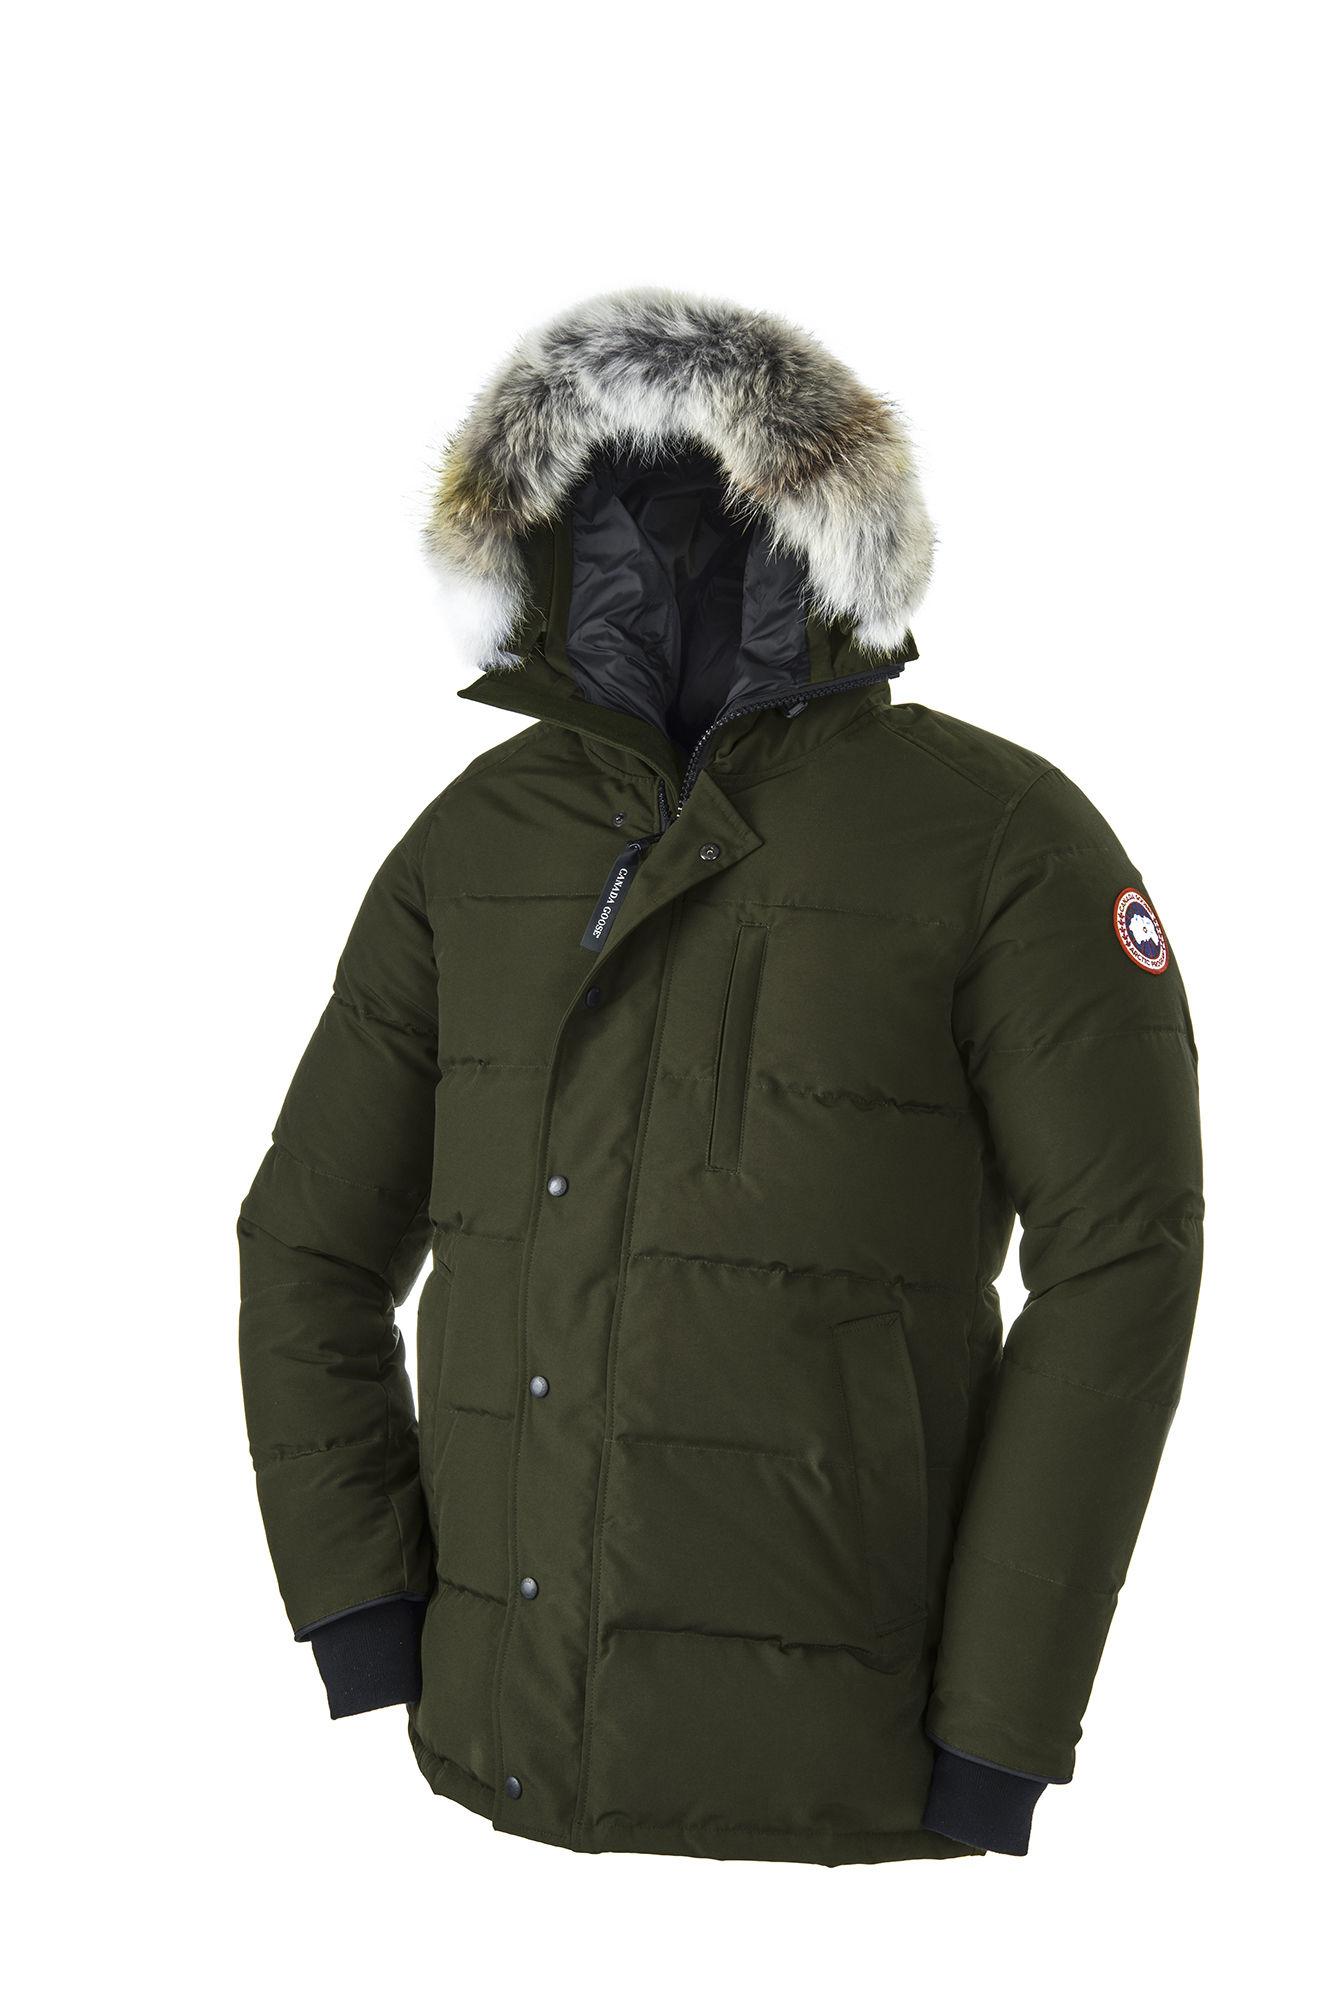 Canada Goose' Hybridge Lite Down Jacket - Men's Military Green